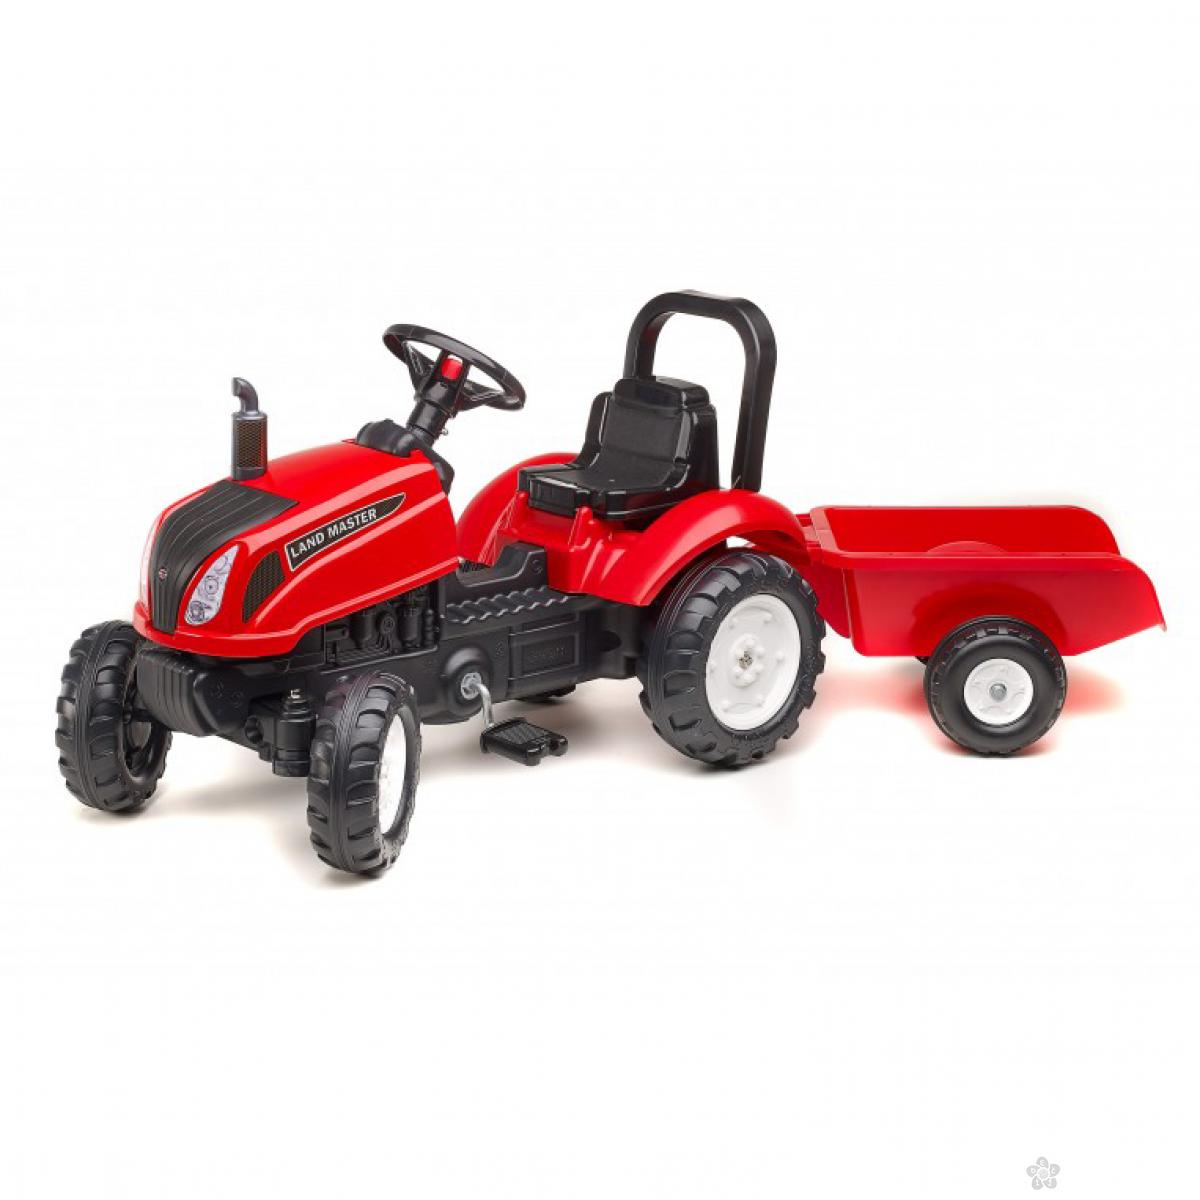 Guralica Falk Traktor Land Master 3081ad